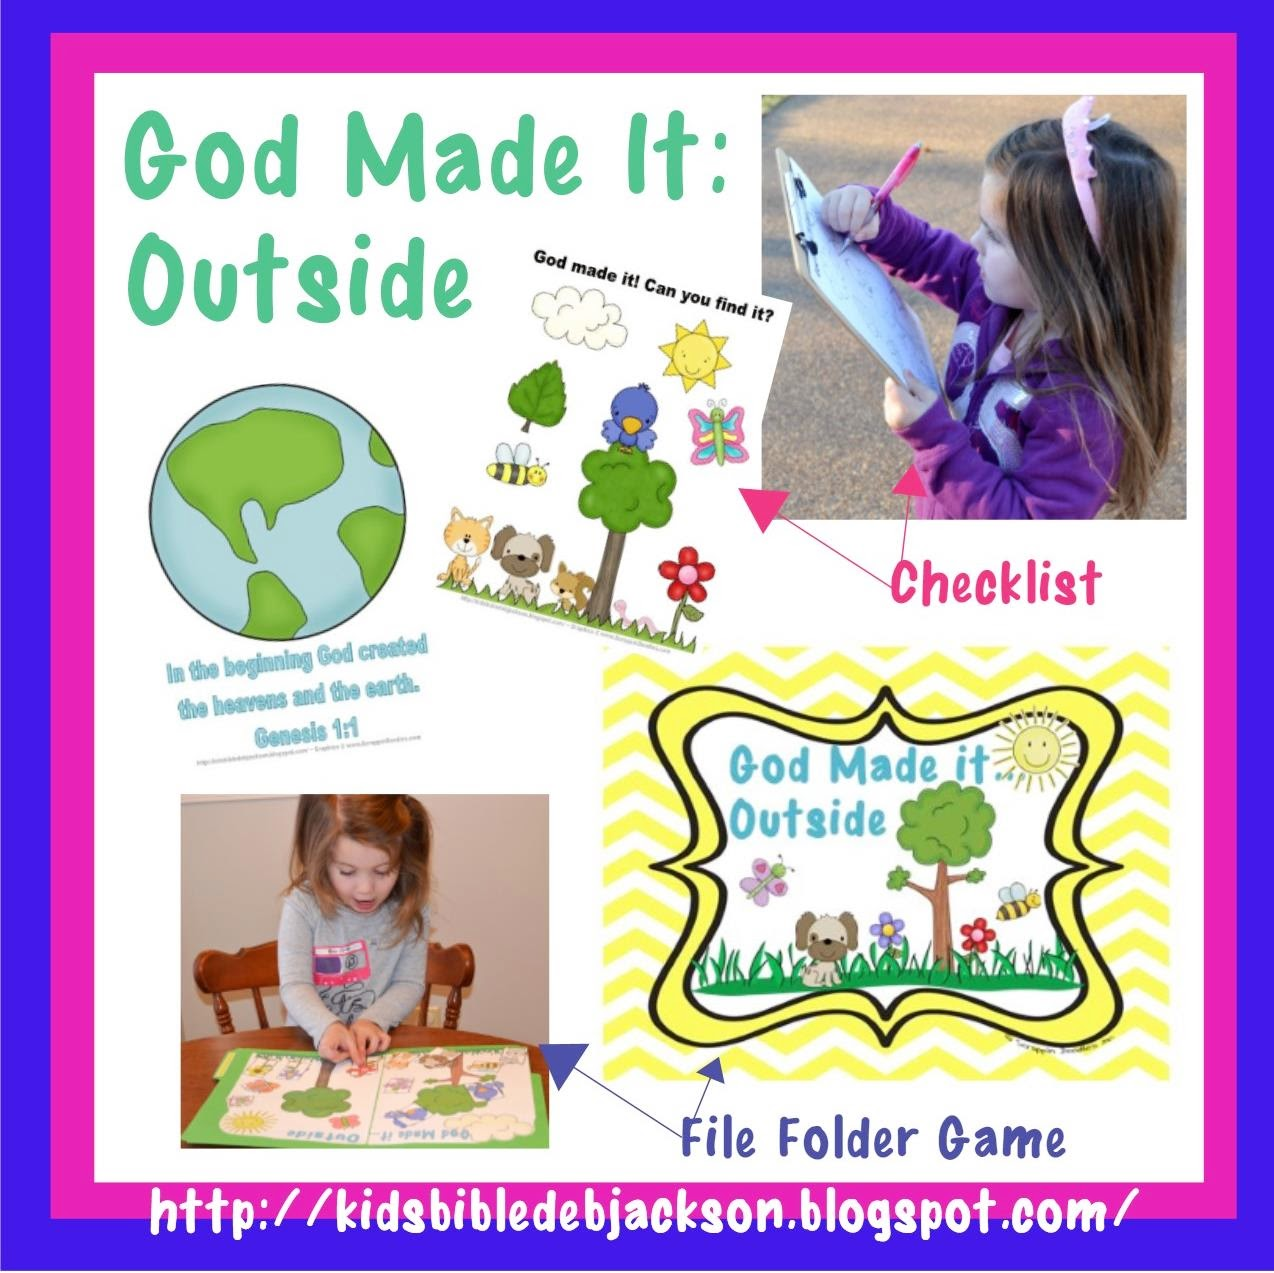 http://kidsbibledebjackson.blogspot.com/2014/04/god-made-it-outside-checklist.html